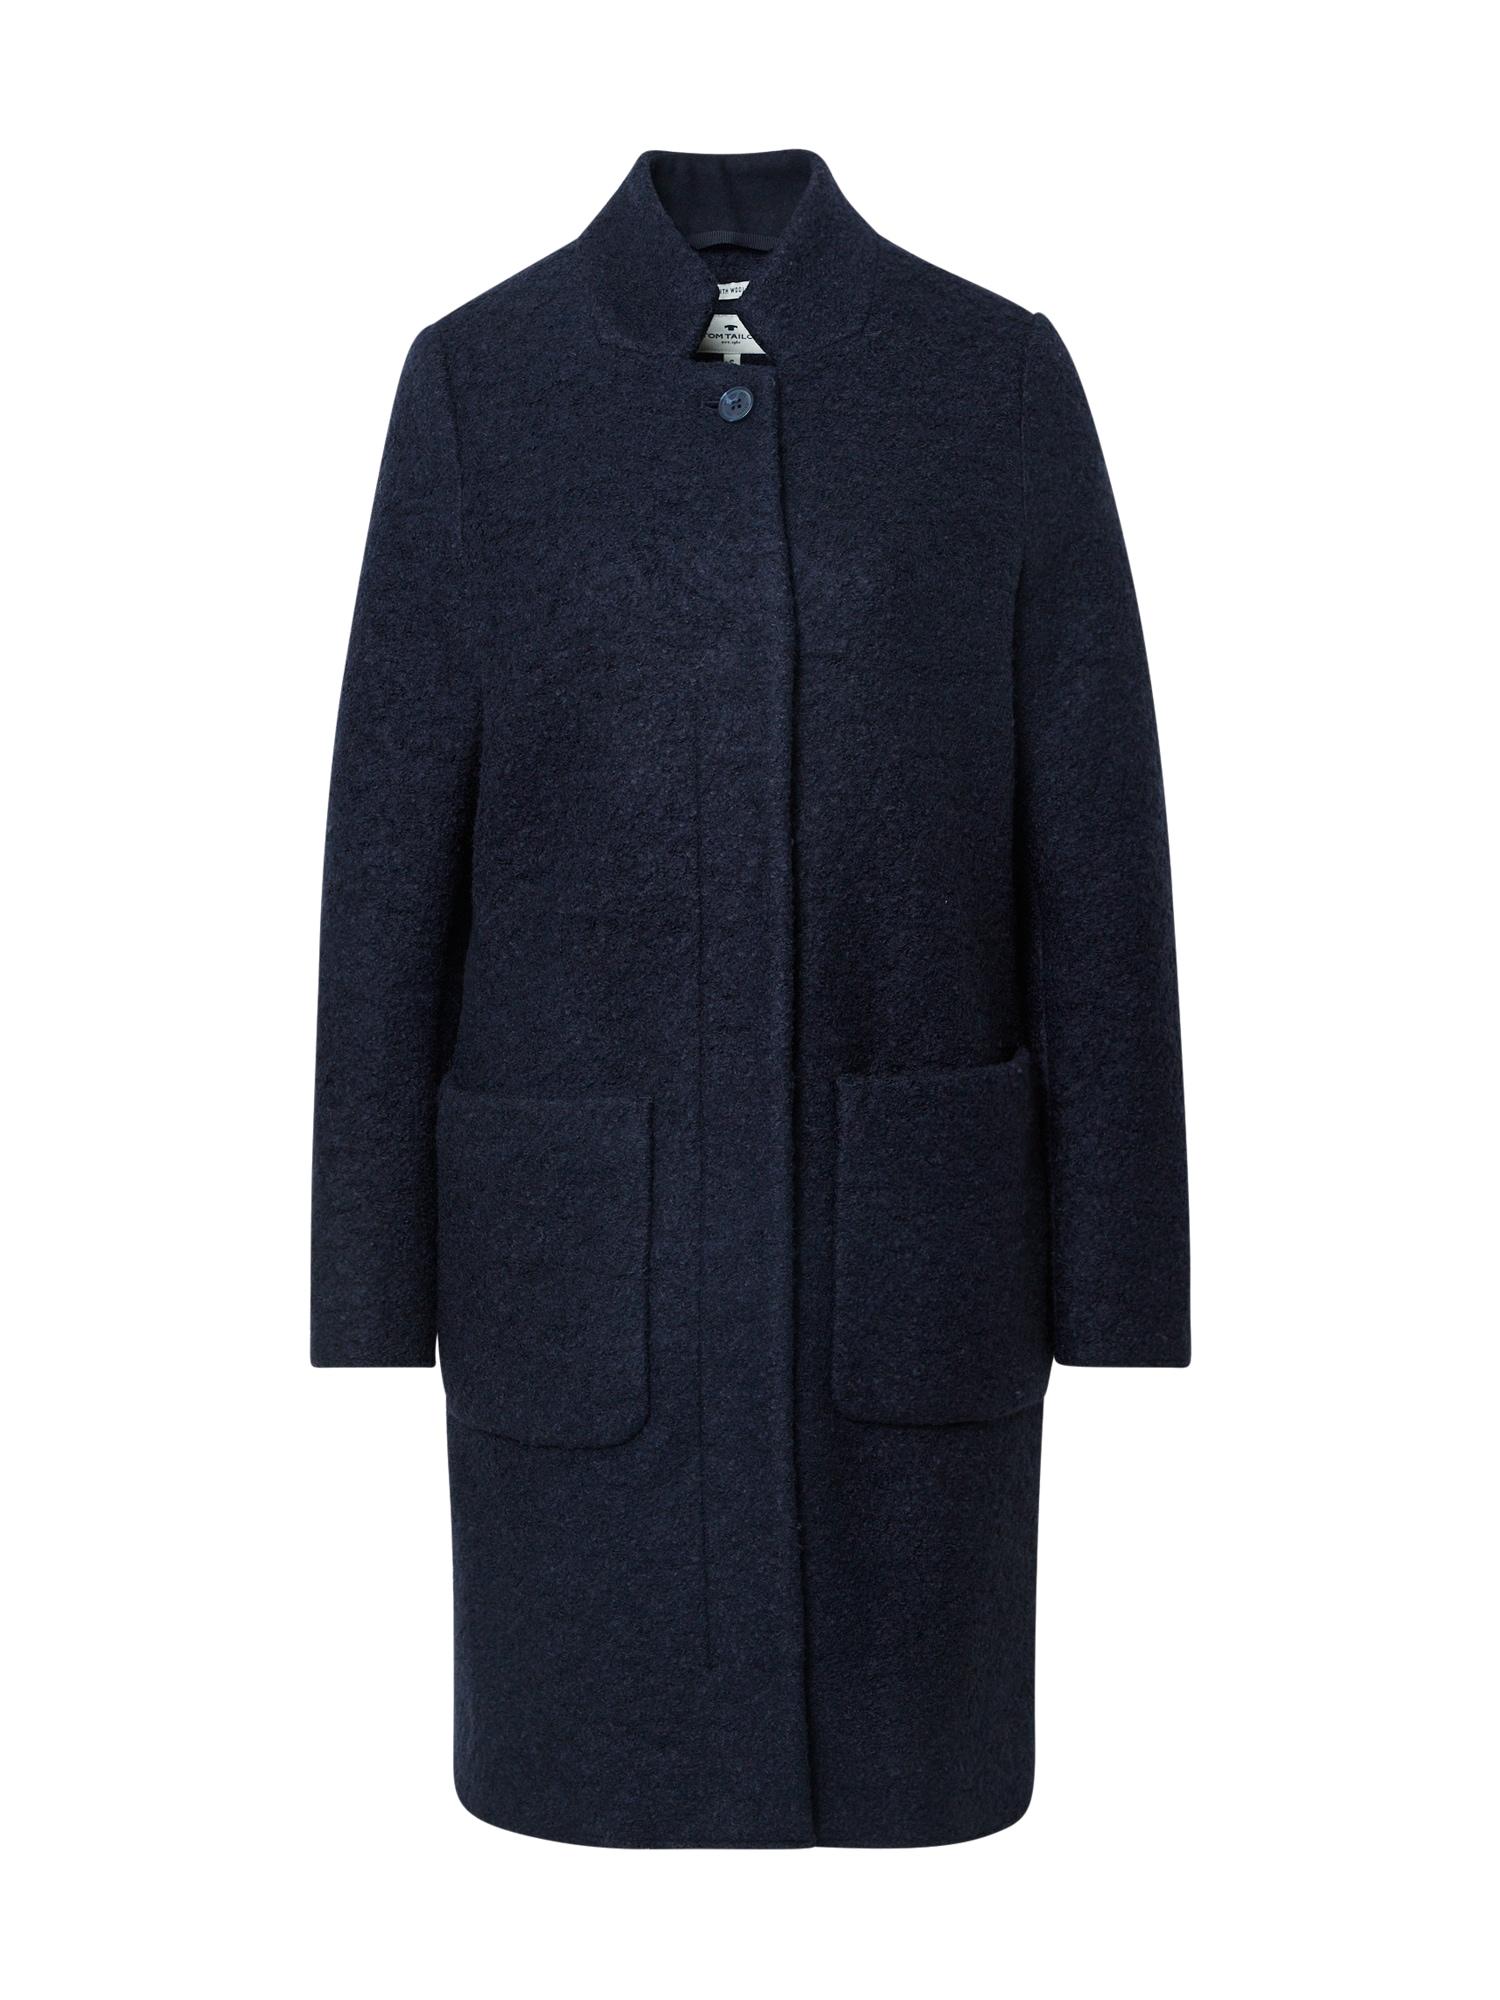 TOM TAILOR Demisezoninis paltas tamsiai mėlyna